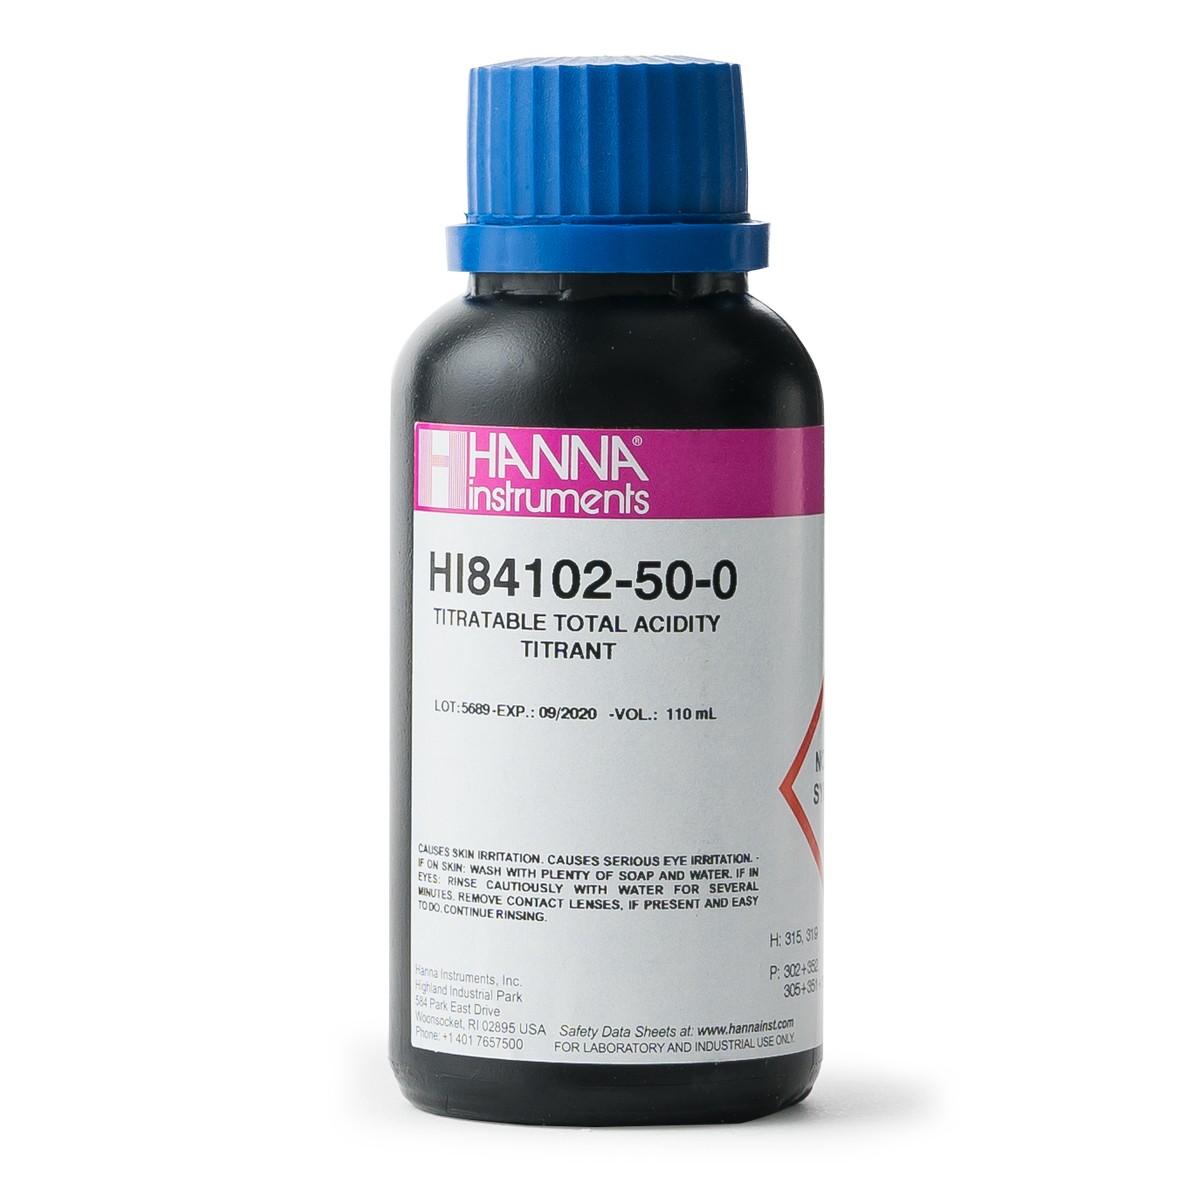 Titulante para Acidez Titulable en Mini Titulador de Vino - HI84102-50